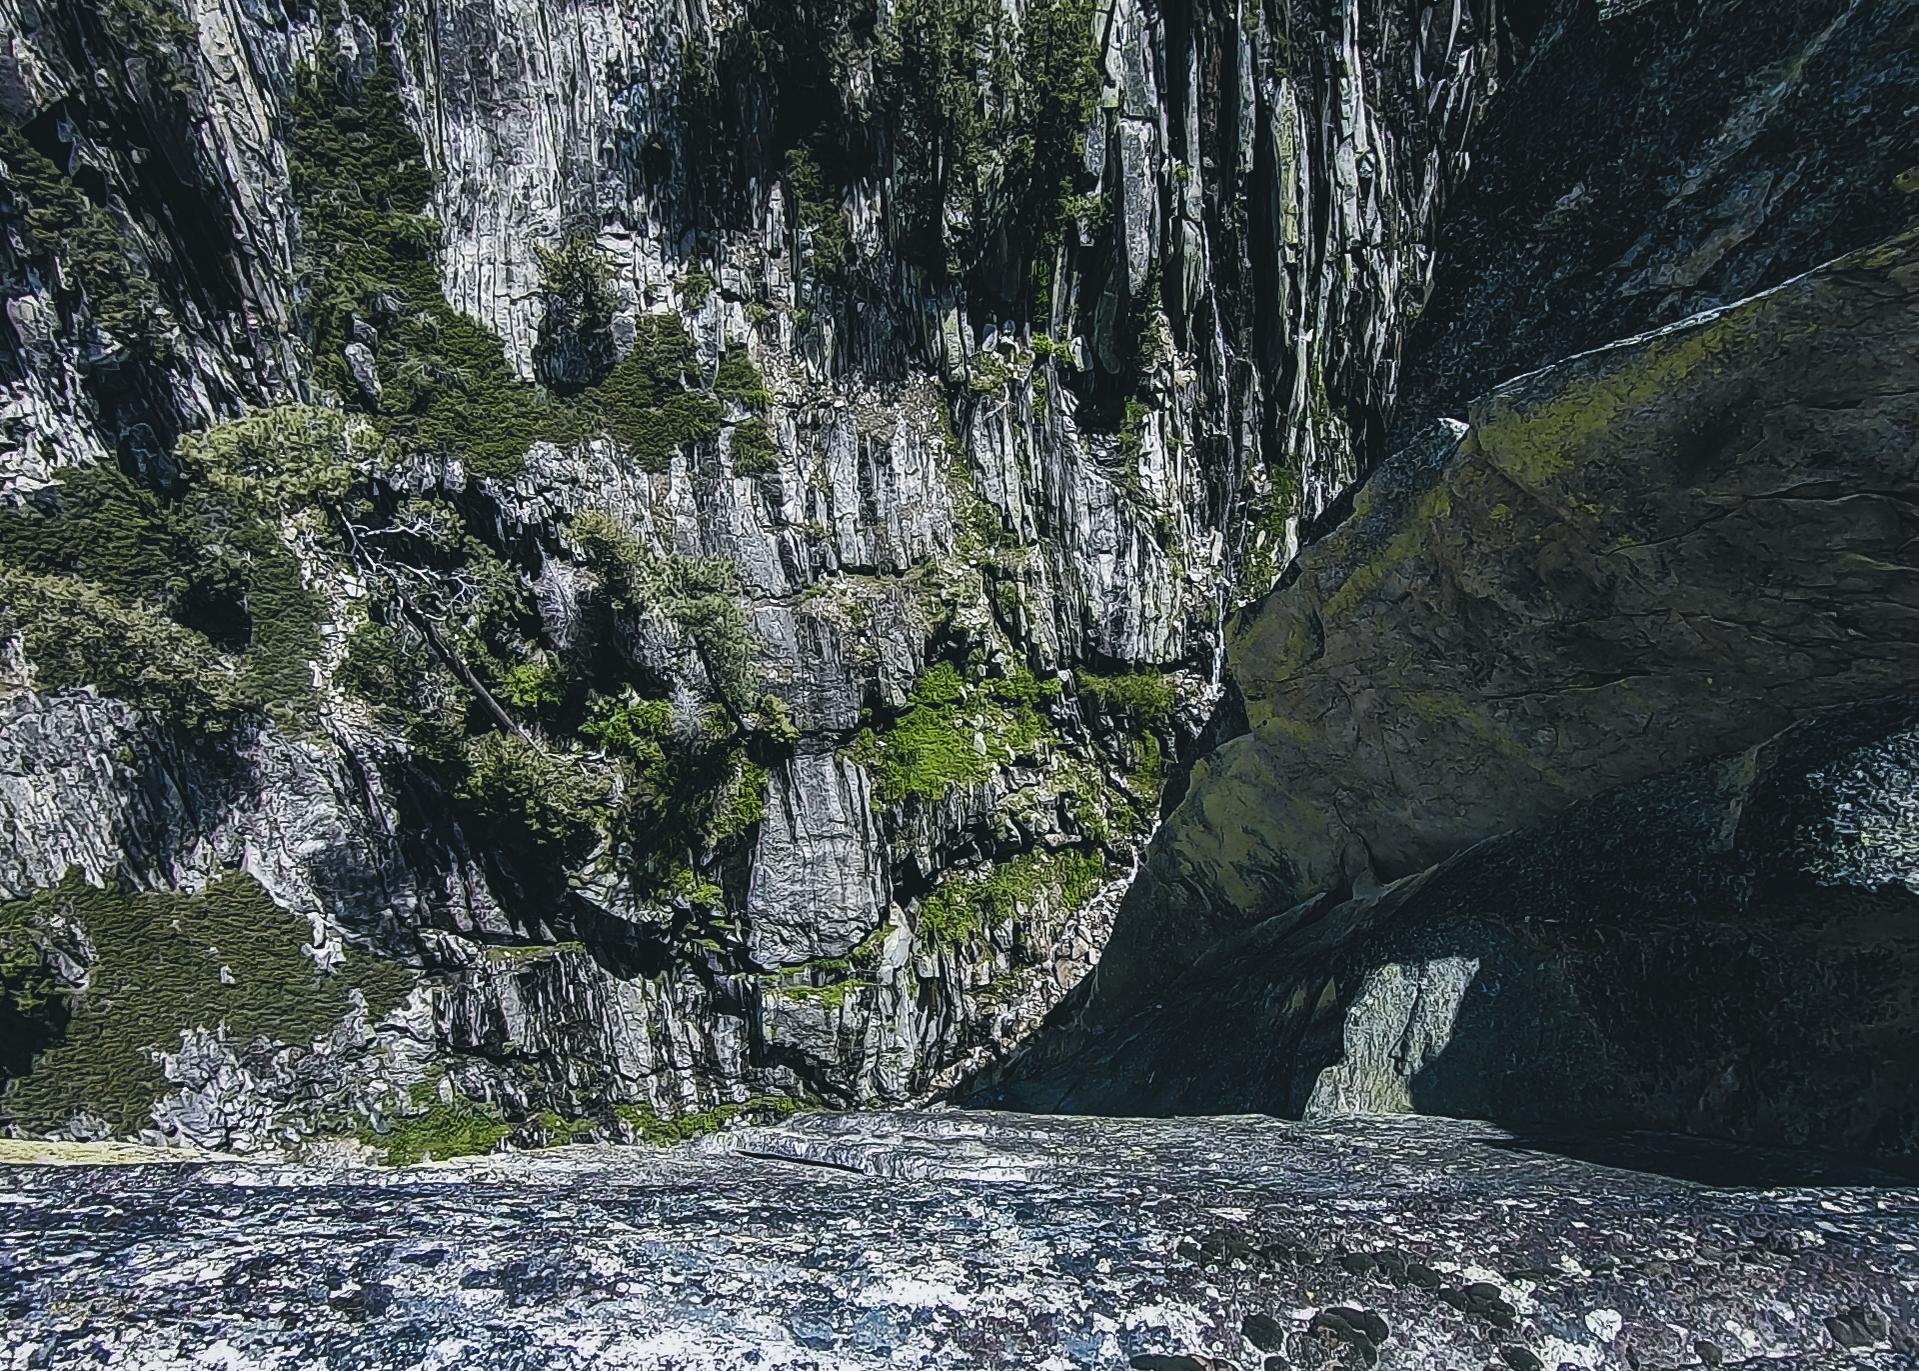 Taft Point Yosemite 2 - Herschl.jpg